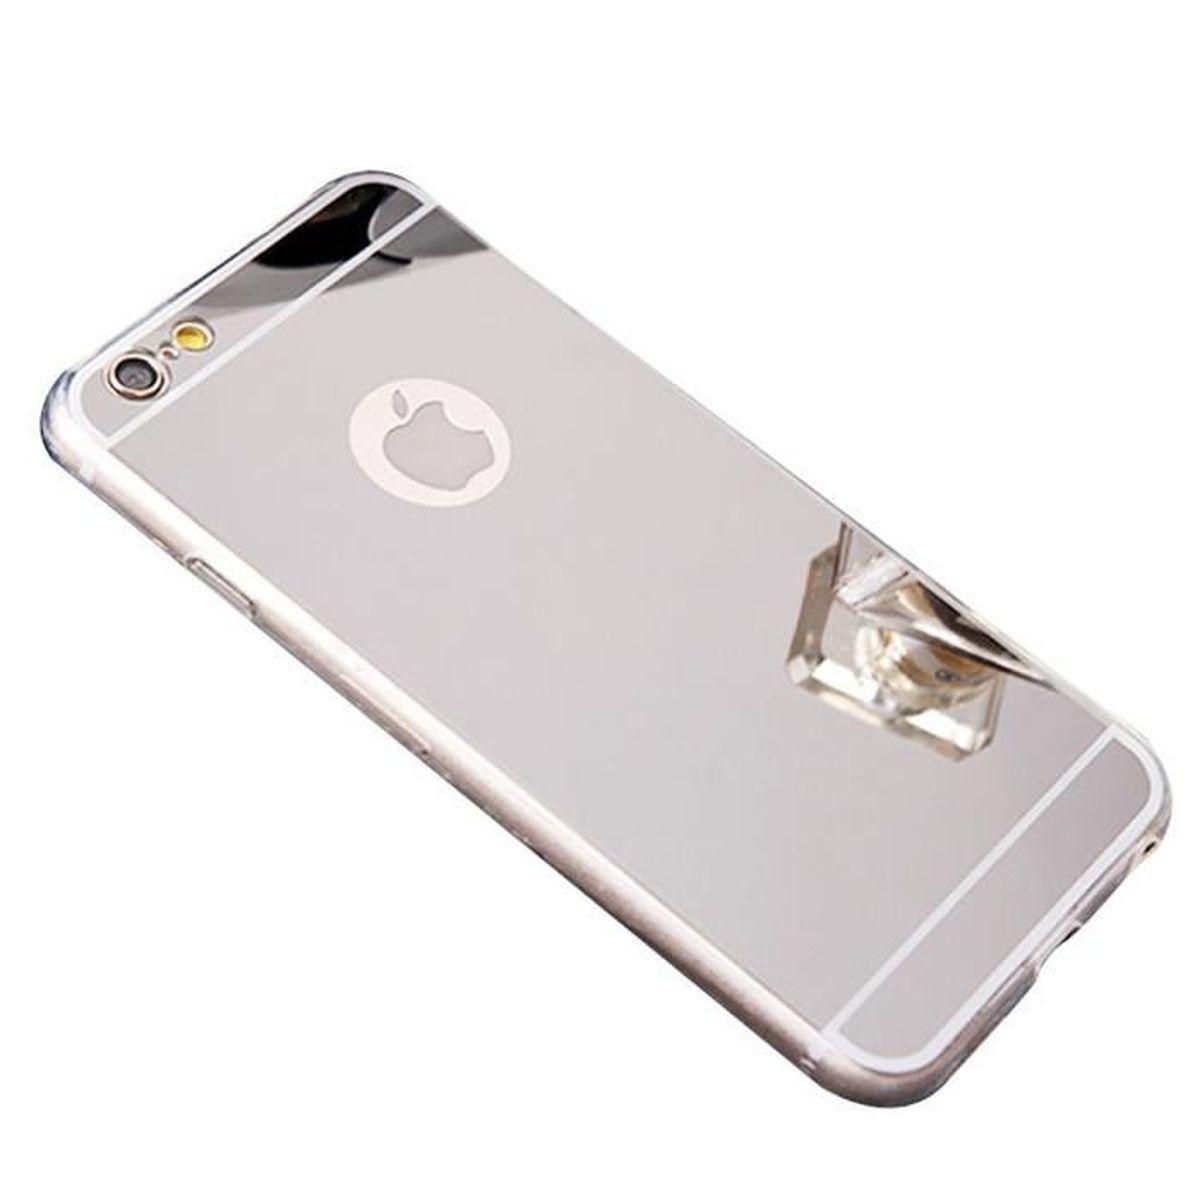 kesu r coque iphone 7s 7 effet miroir coloris arg